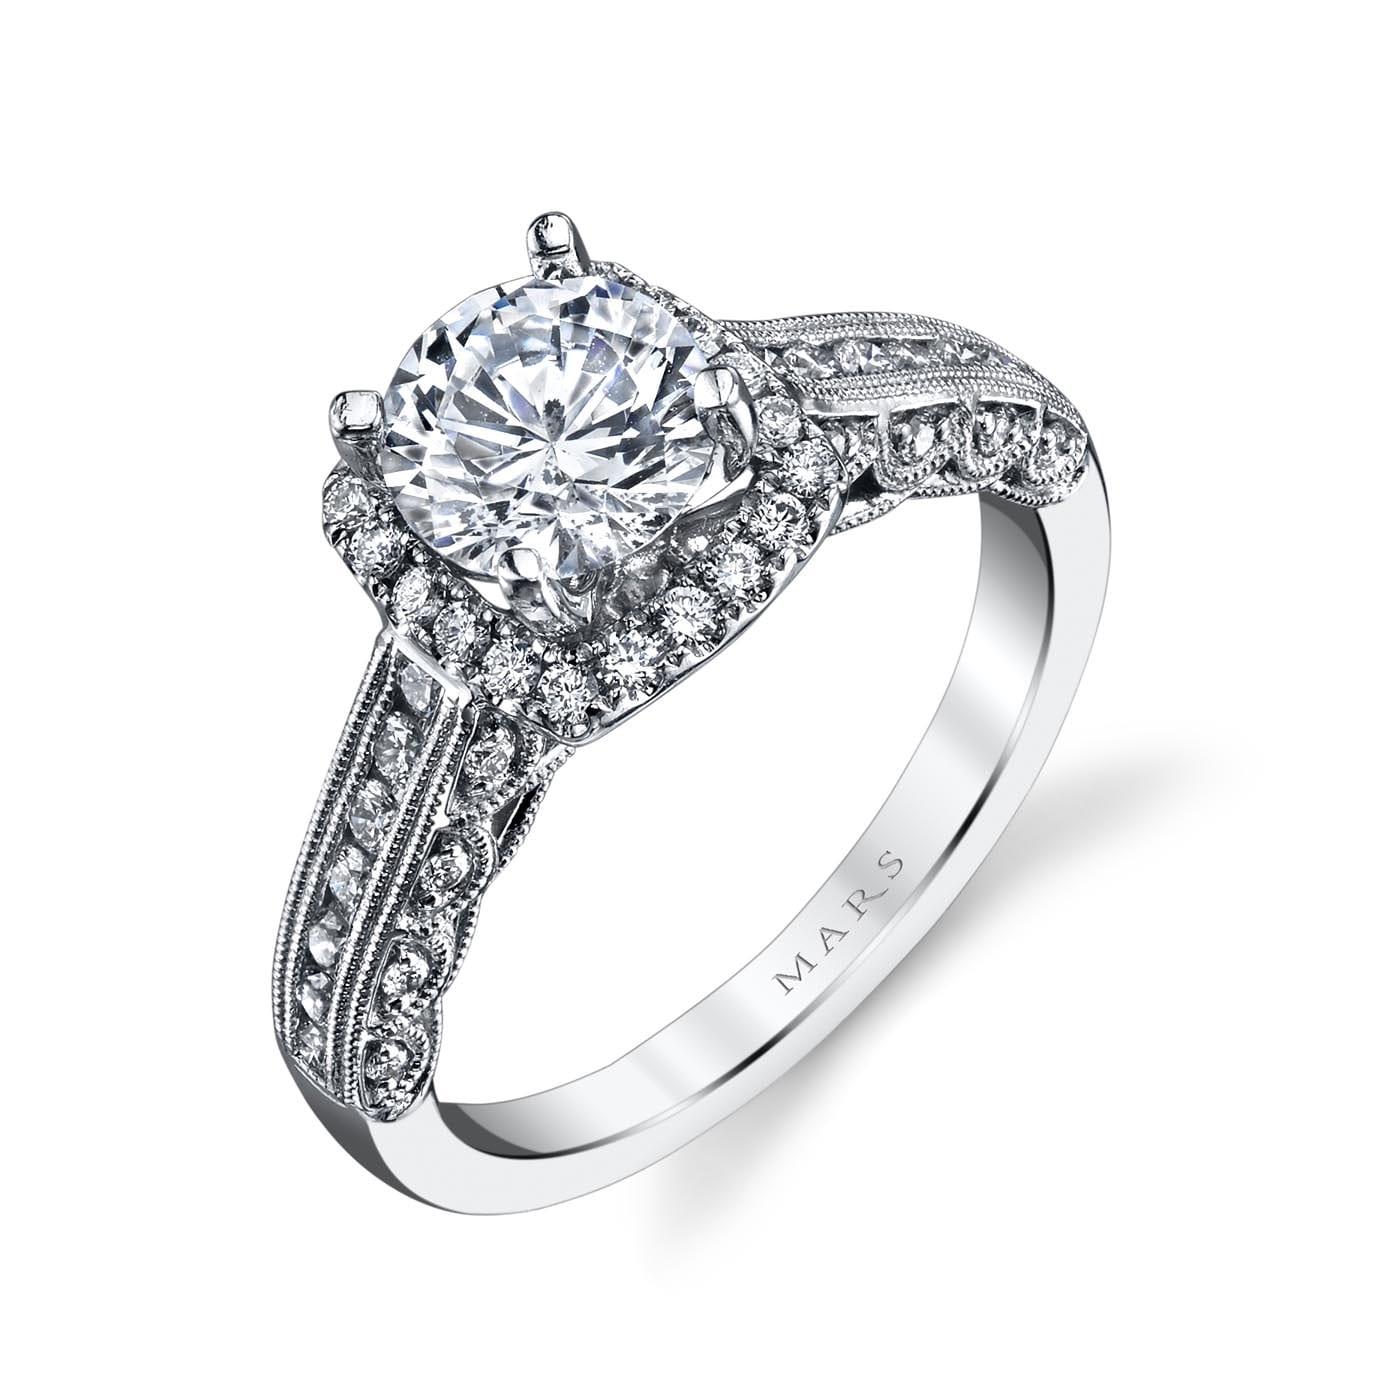 Halo Engagement RingStyle #: MARS 26701